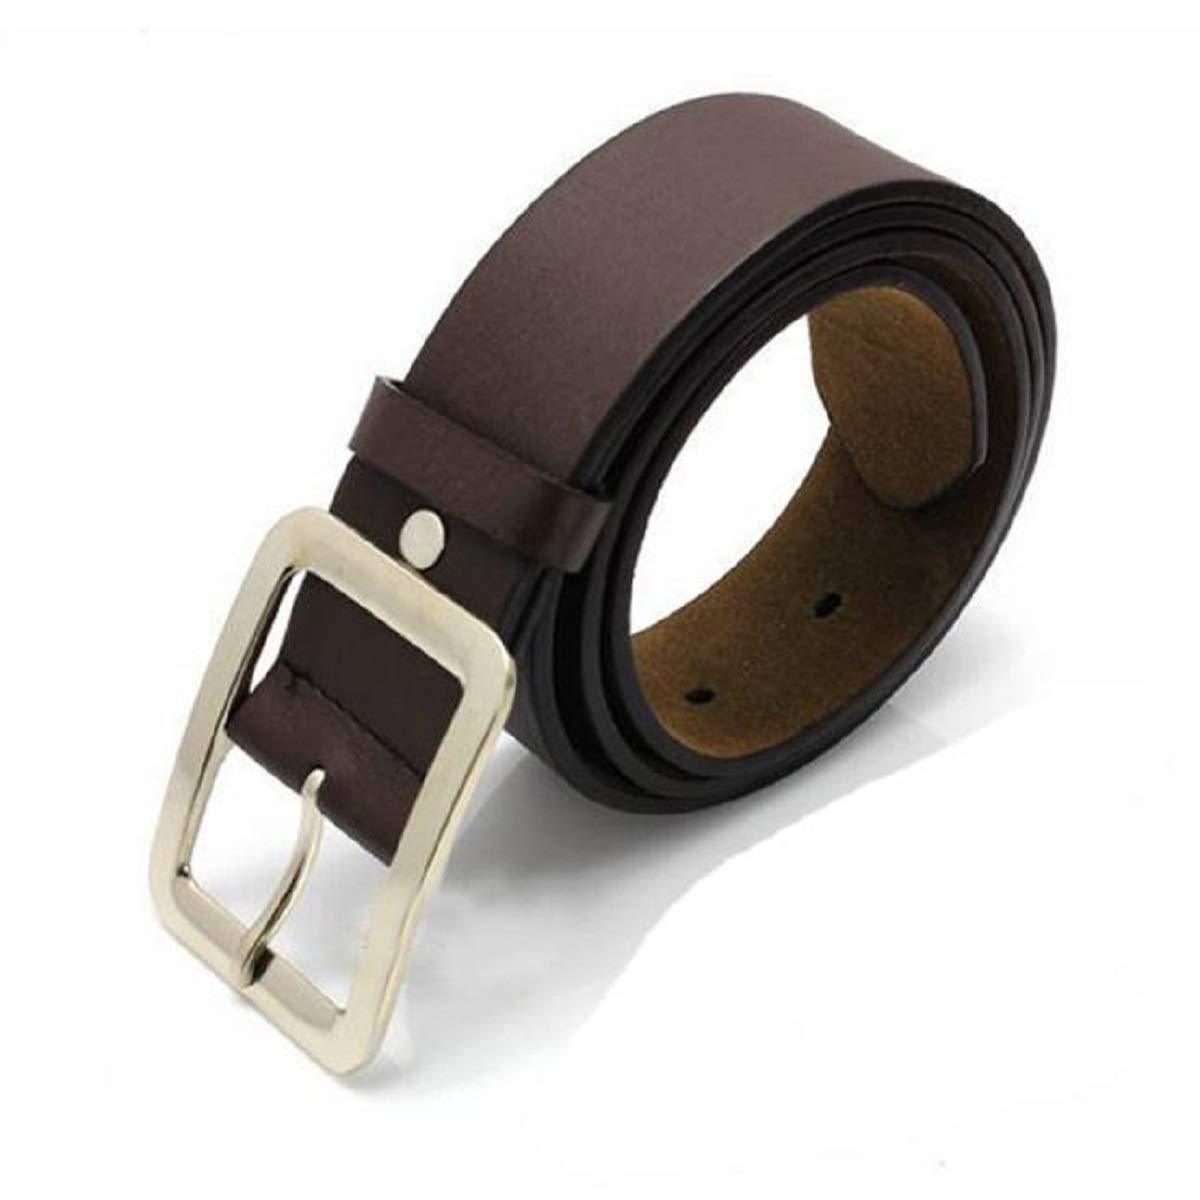 Canvas Belt For Men,Men's Casual Faux Leather Belt Buckle Waist Strap Belts,Men's Accessories,Coffee,2019 Clearace Sale